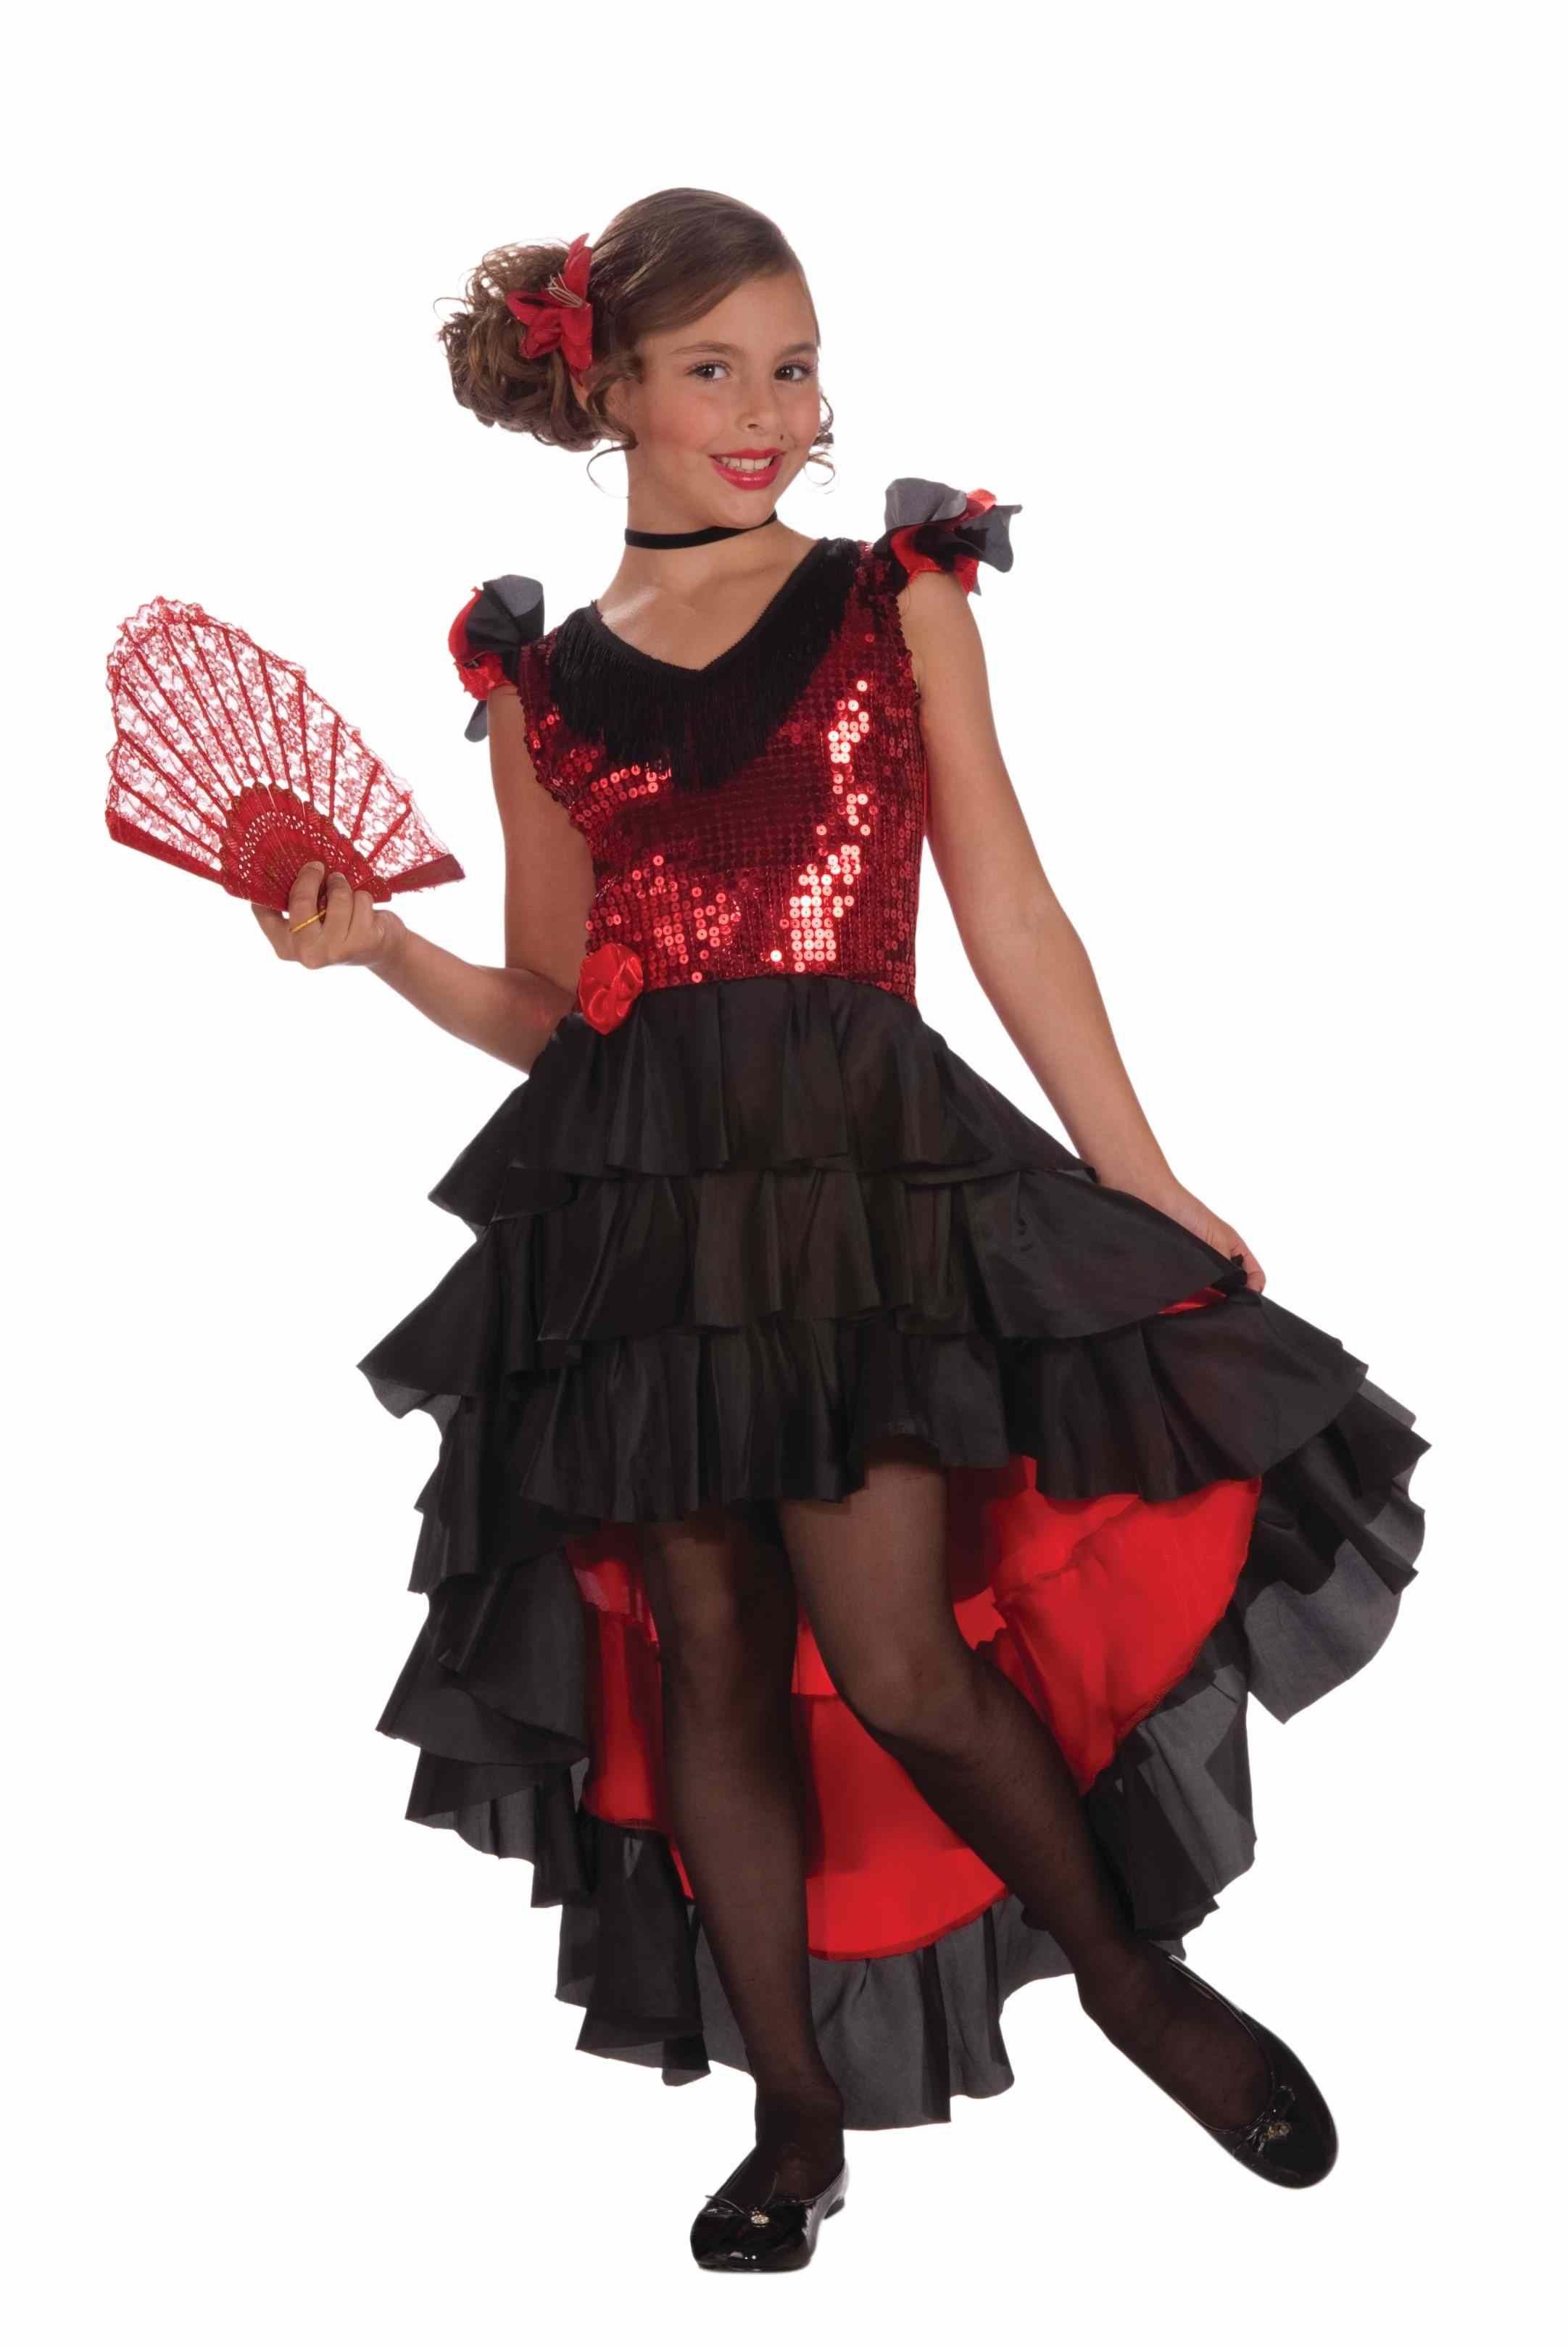 Kids Spanish Dancer Girls Costume   $27.99   The Costume Land